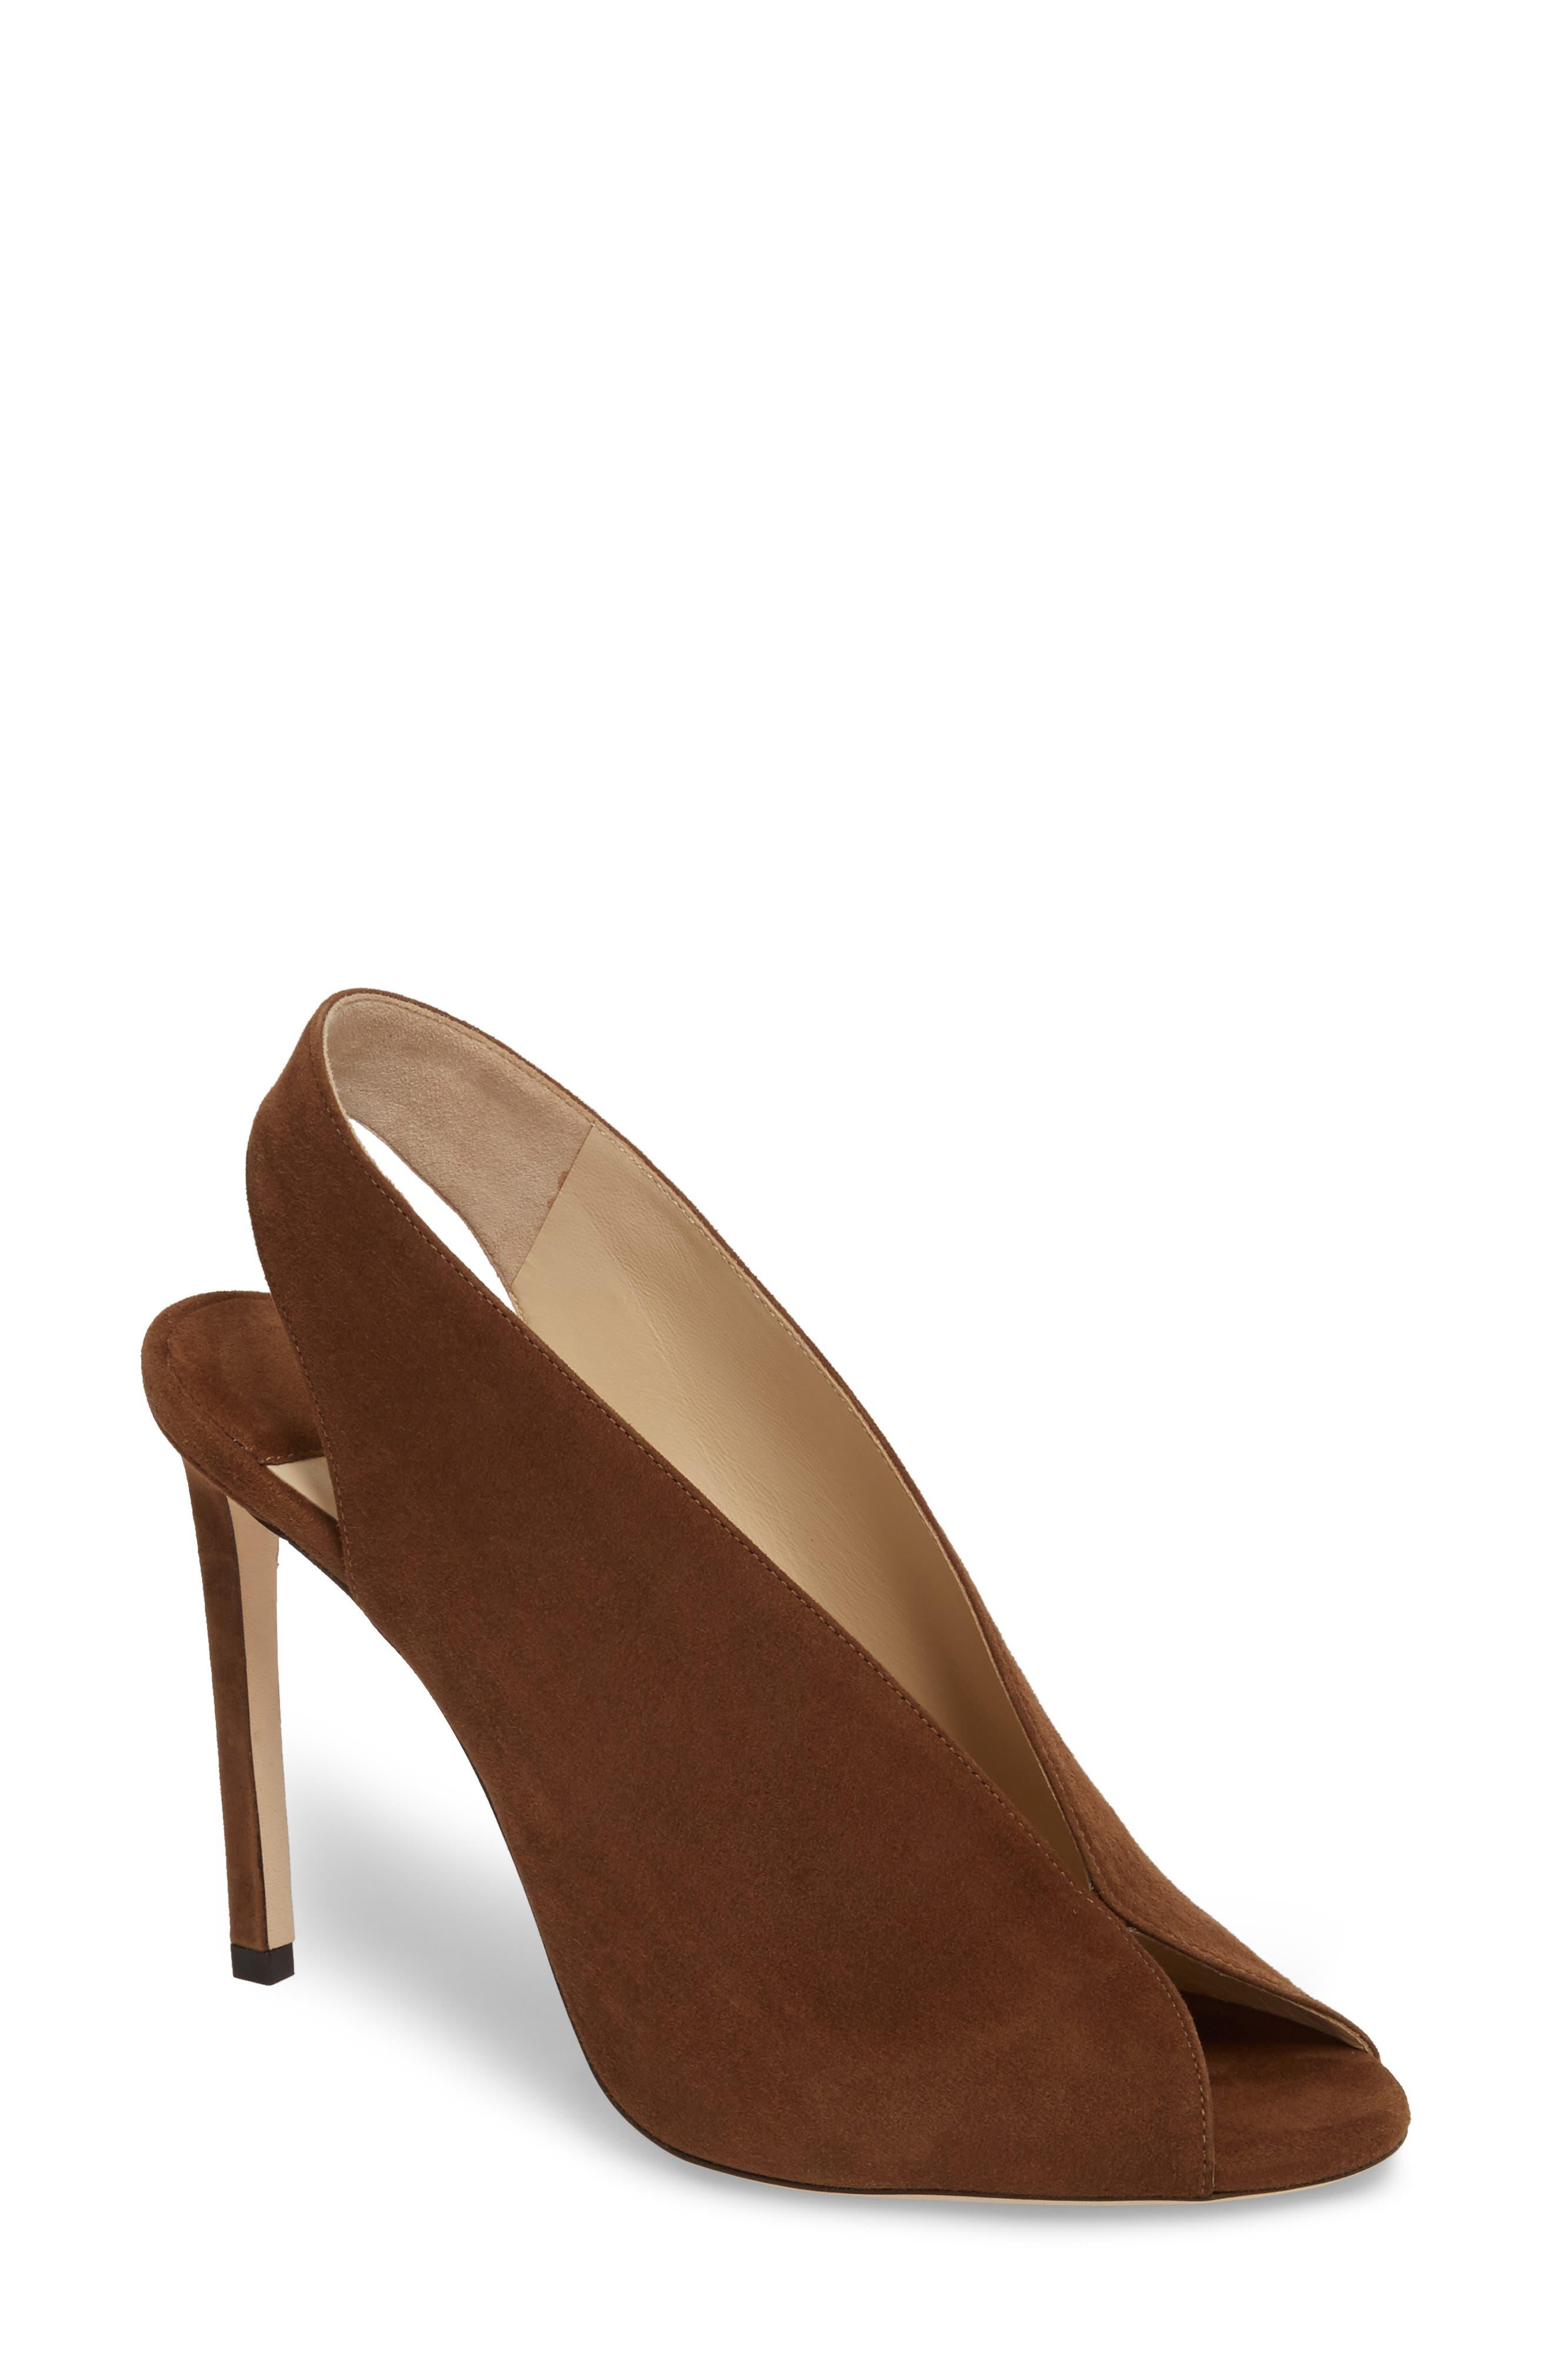 Shar Peep Toe Slingback Pump,                             Main thumbnail 1, color,                             Cacao Brown